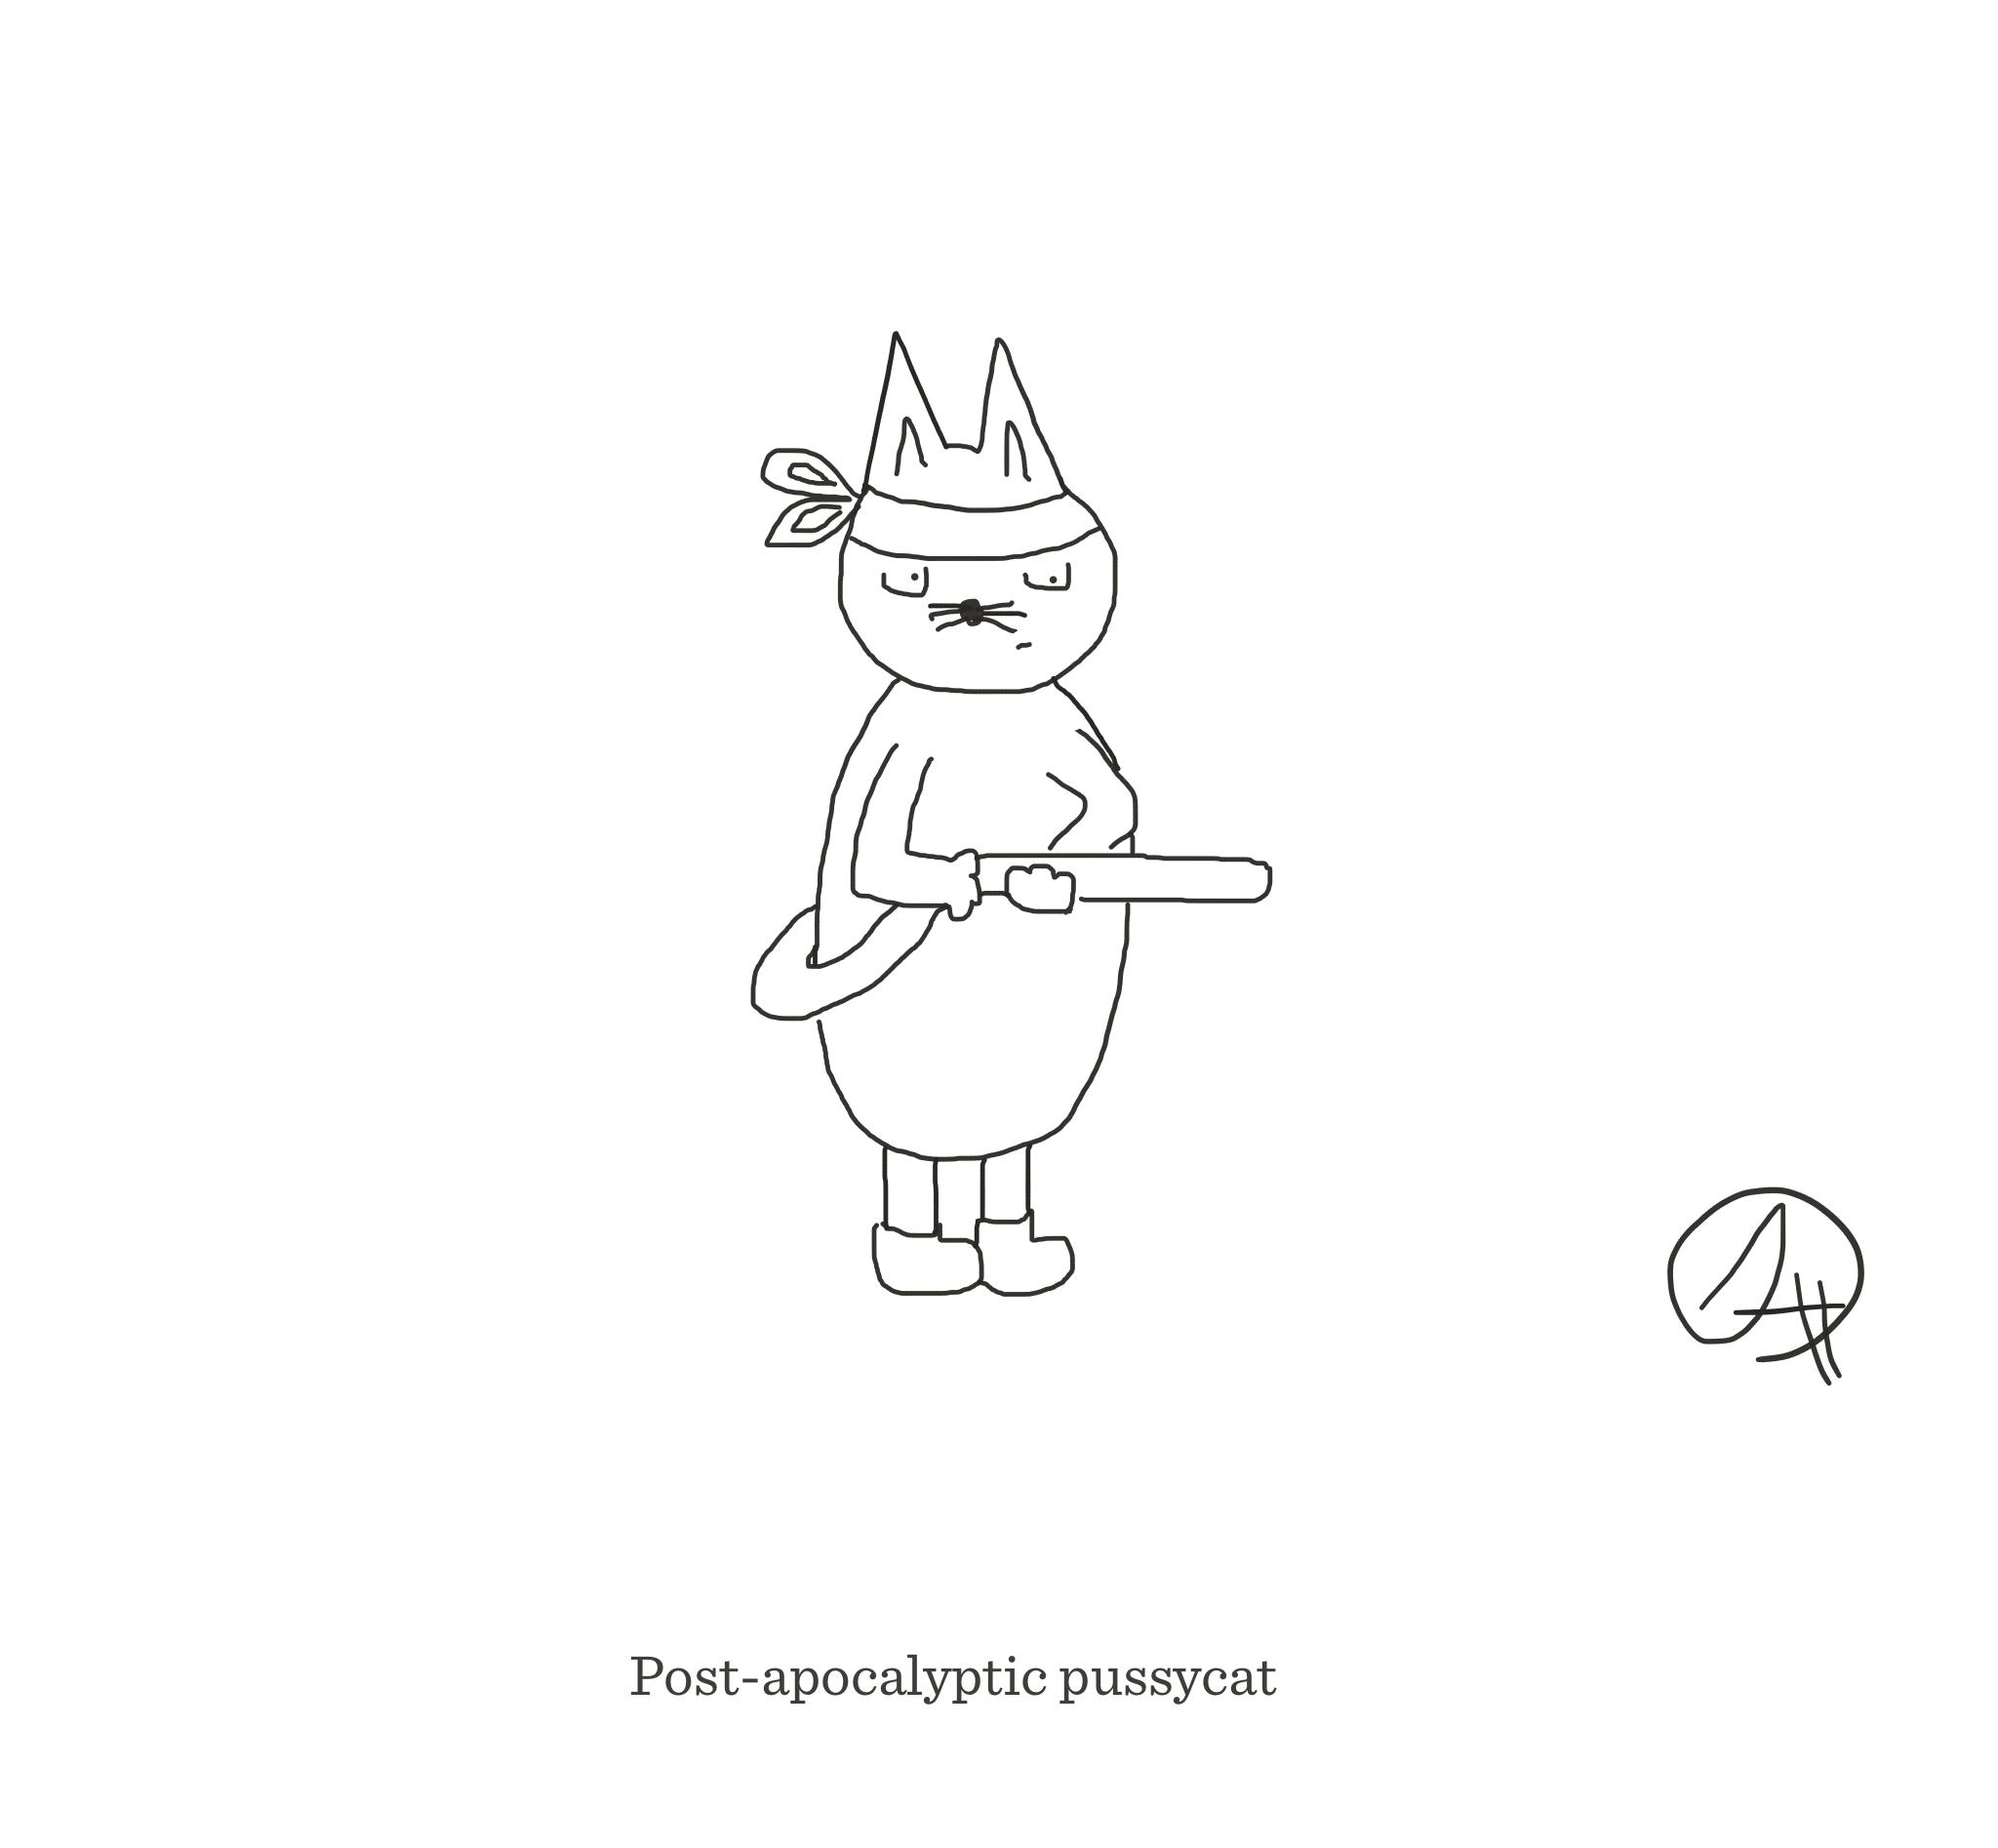 Post-apocalyptic pussycat, The Happy Rat, Sarah Hunt